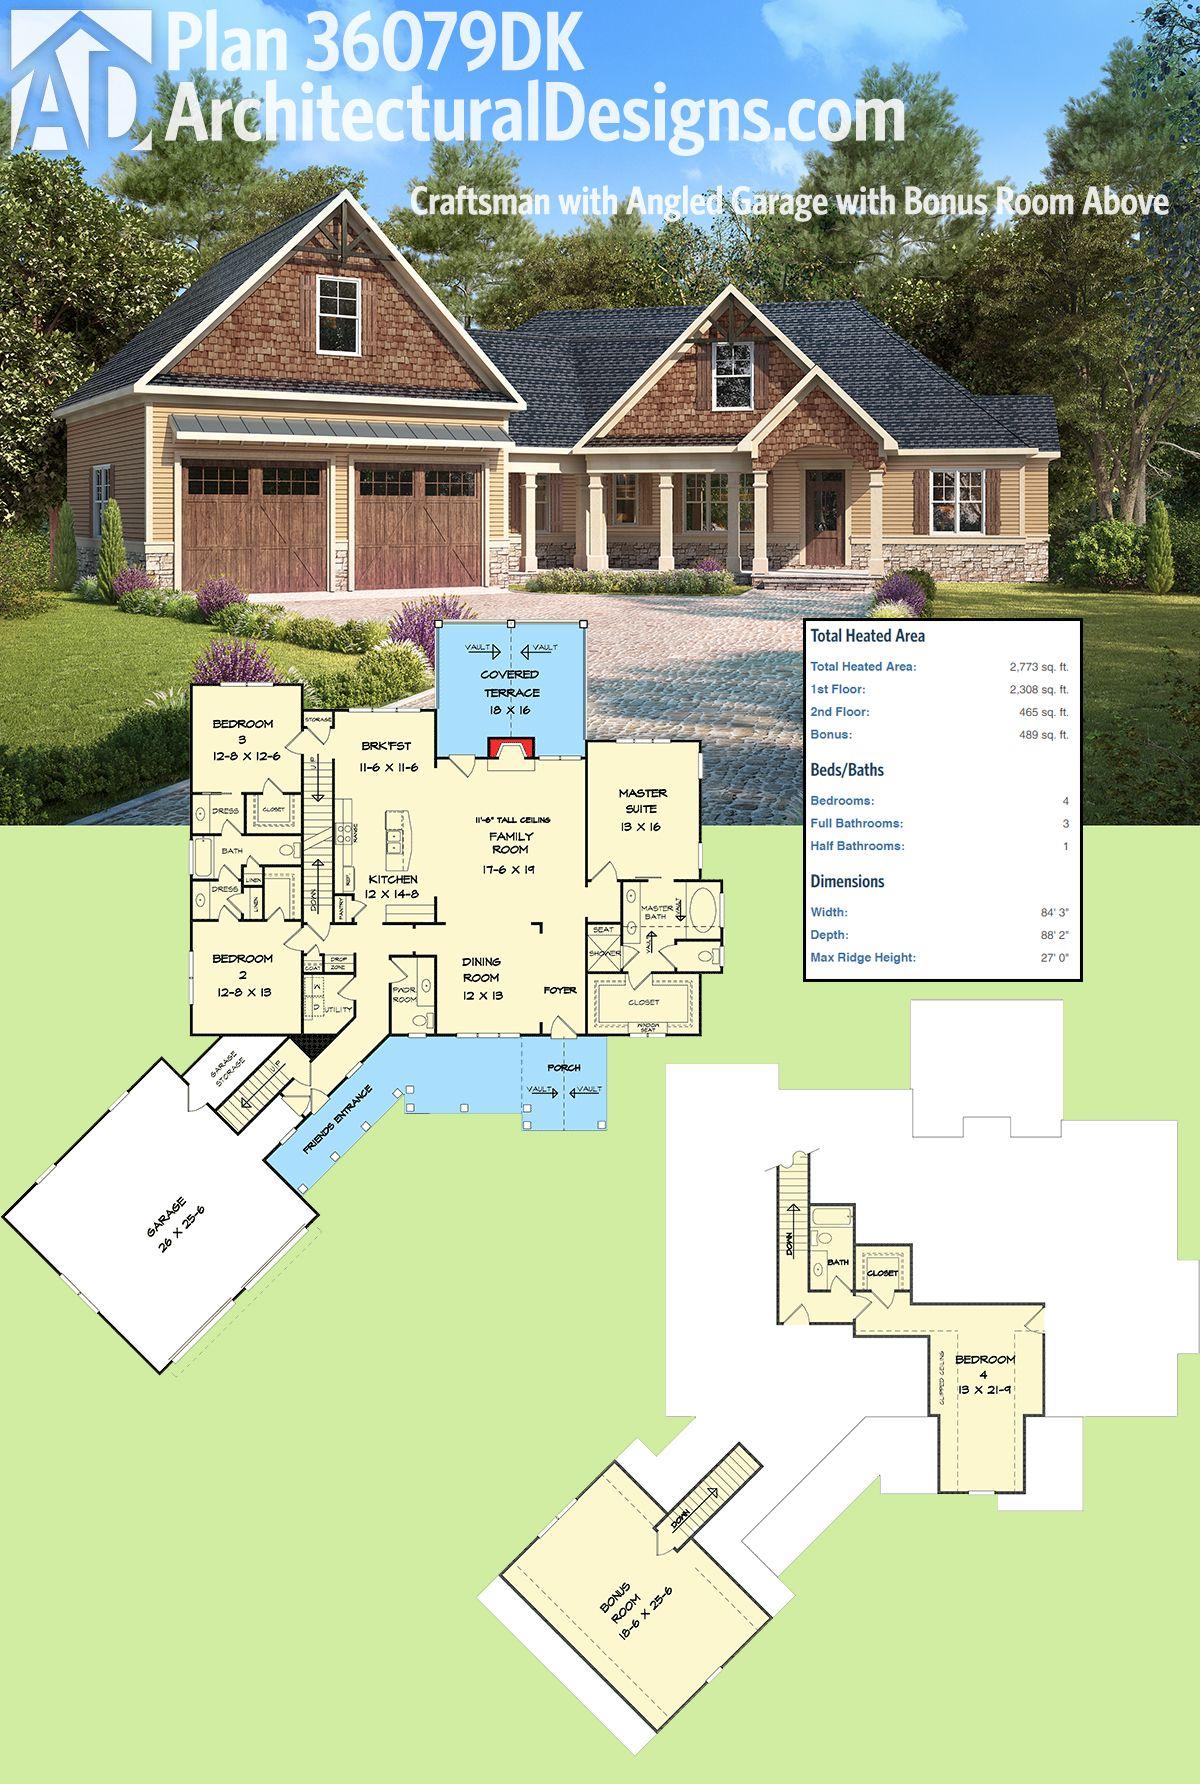 Plan 36079dk Craftsman With Angled Garage Bonus Room